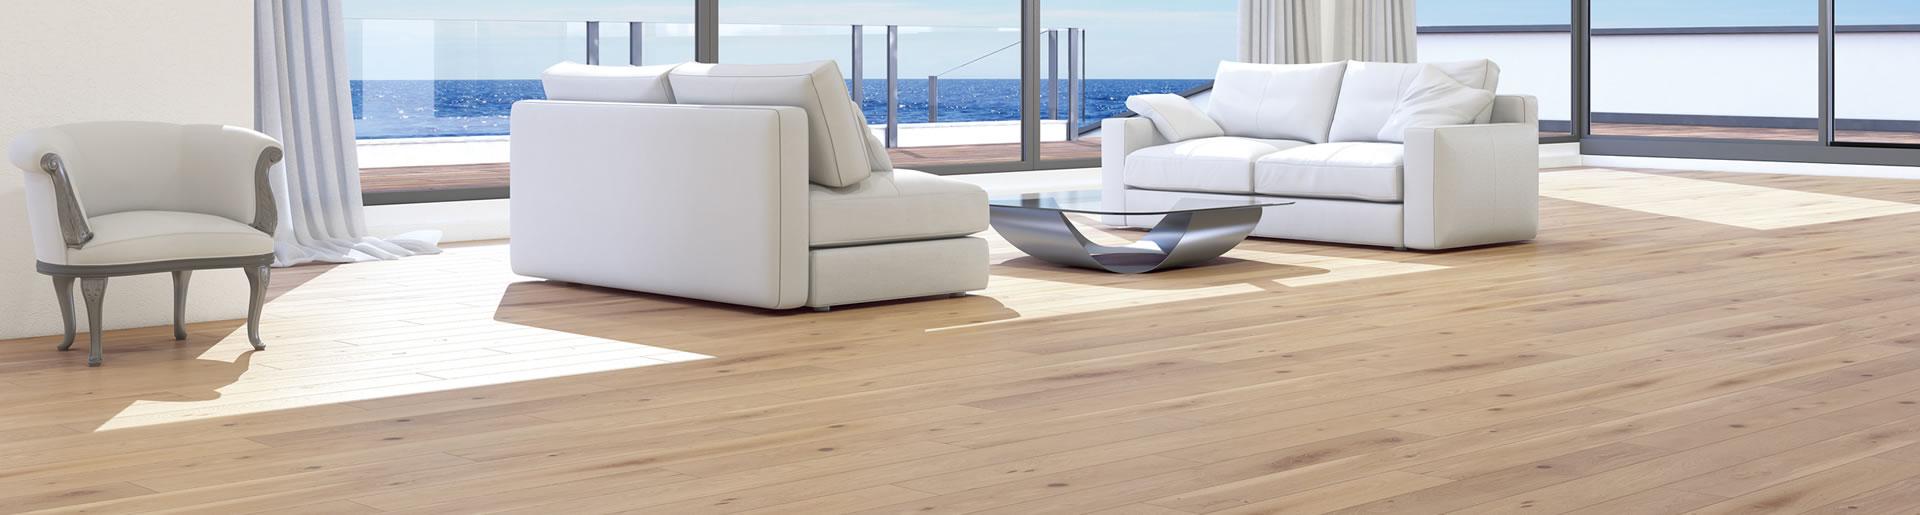 keck parkett althengstett parkett verlegen calw parkettboden laminatboden pvc boden. Black Bedroom Furniture Sets. Home Design Ideas